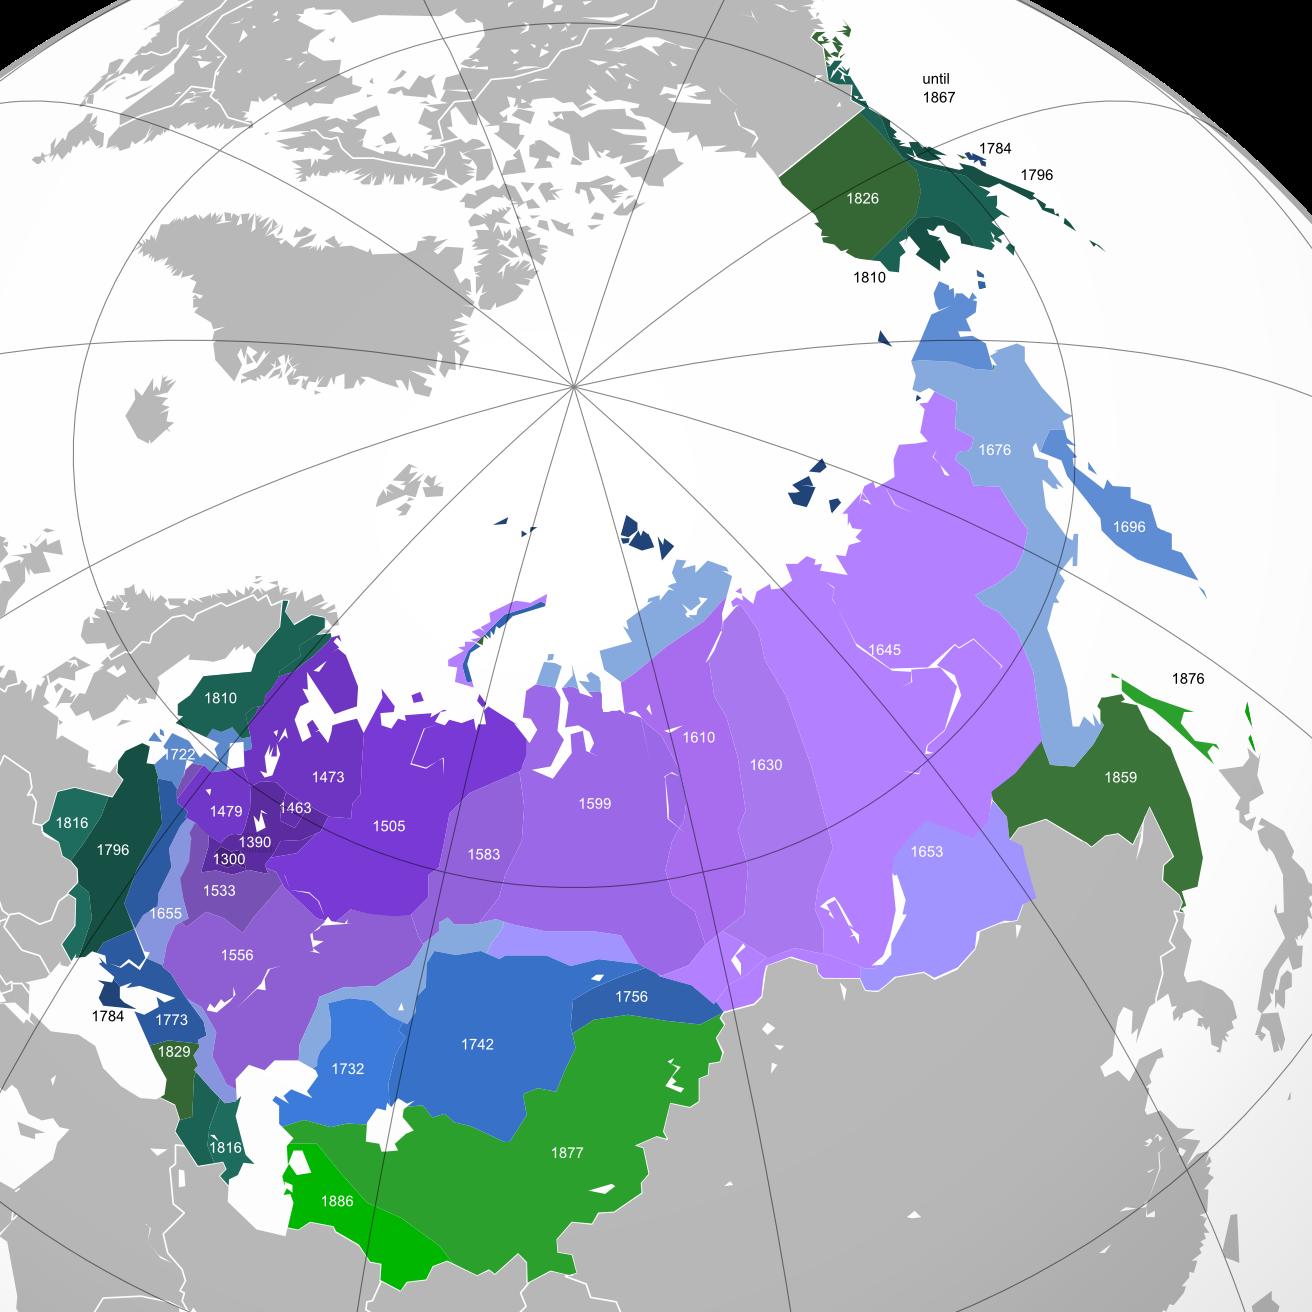 https://alternativetransport.files.wordpress.com/2015/03/russian_expansion_1300-1914.png